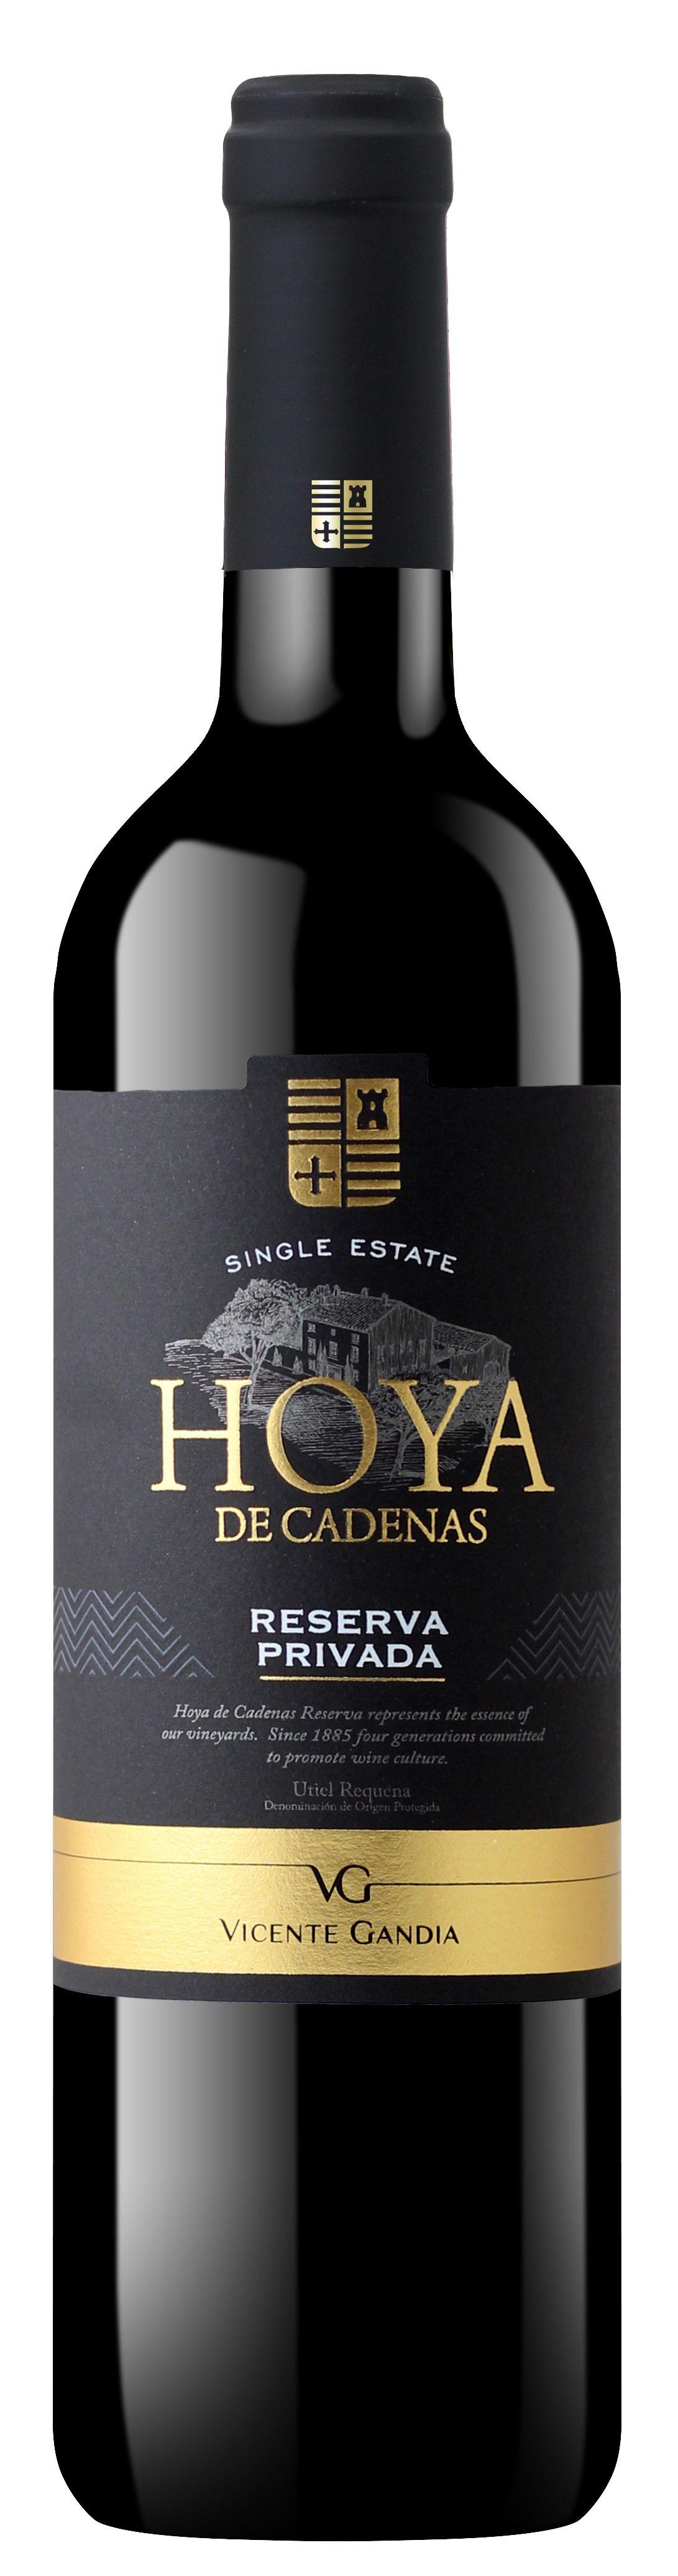 Vicente Gandia Hoya de Cadenas, Reserva Privada